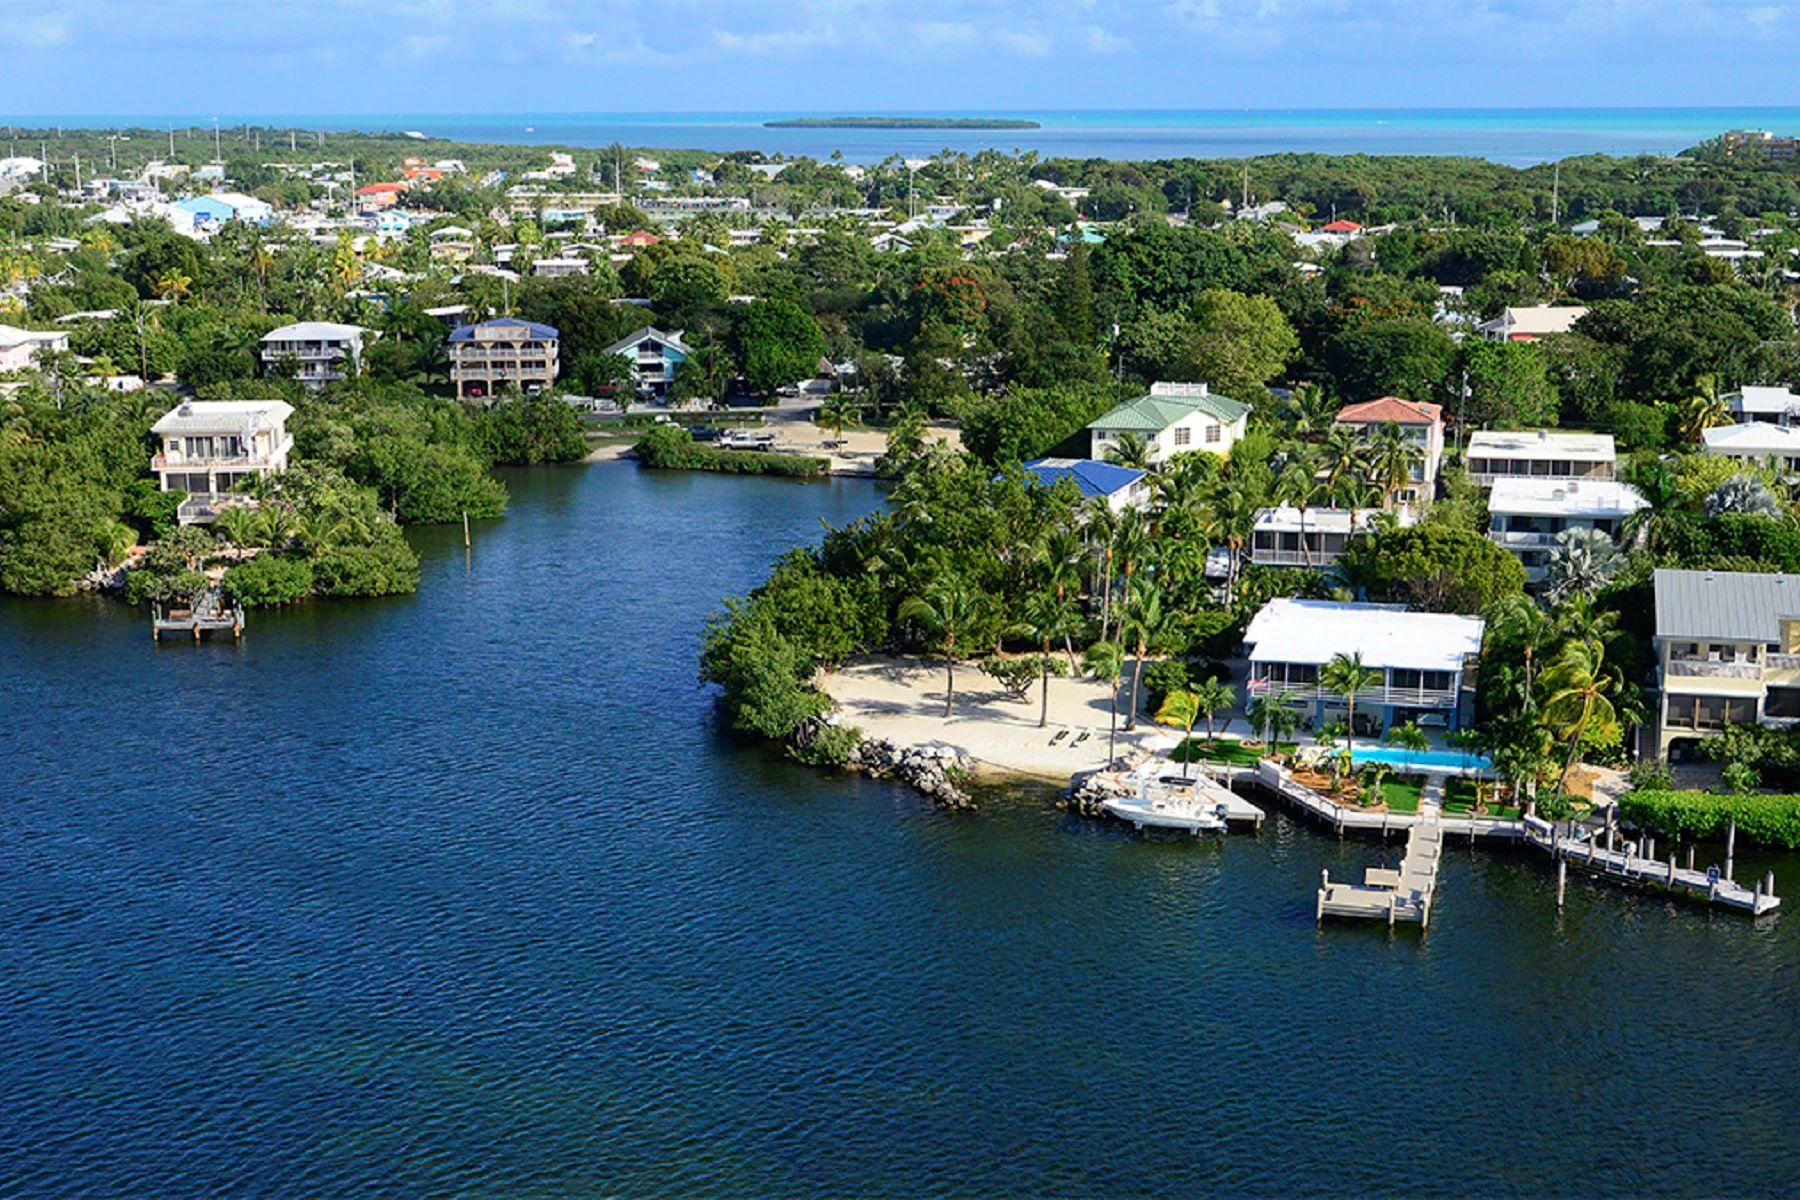 Terreno por un Venta en Bayfront Parcel 436 S Coconut Palm Blvd Islamorada, Florida, 33070 Estados Unidos